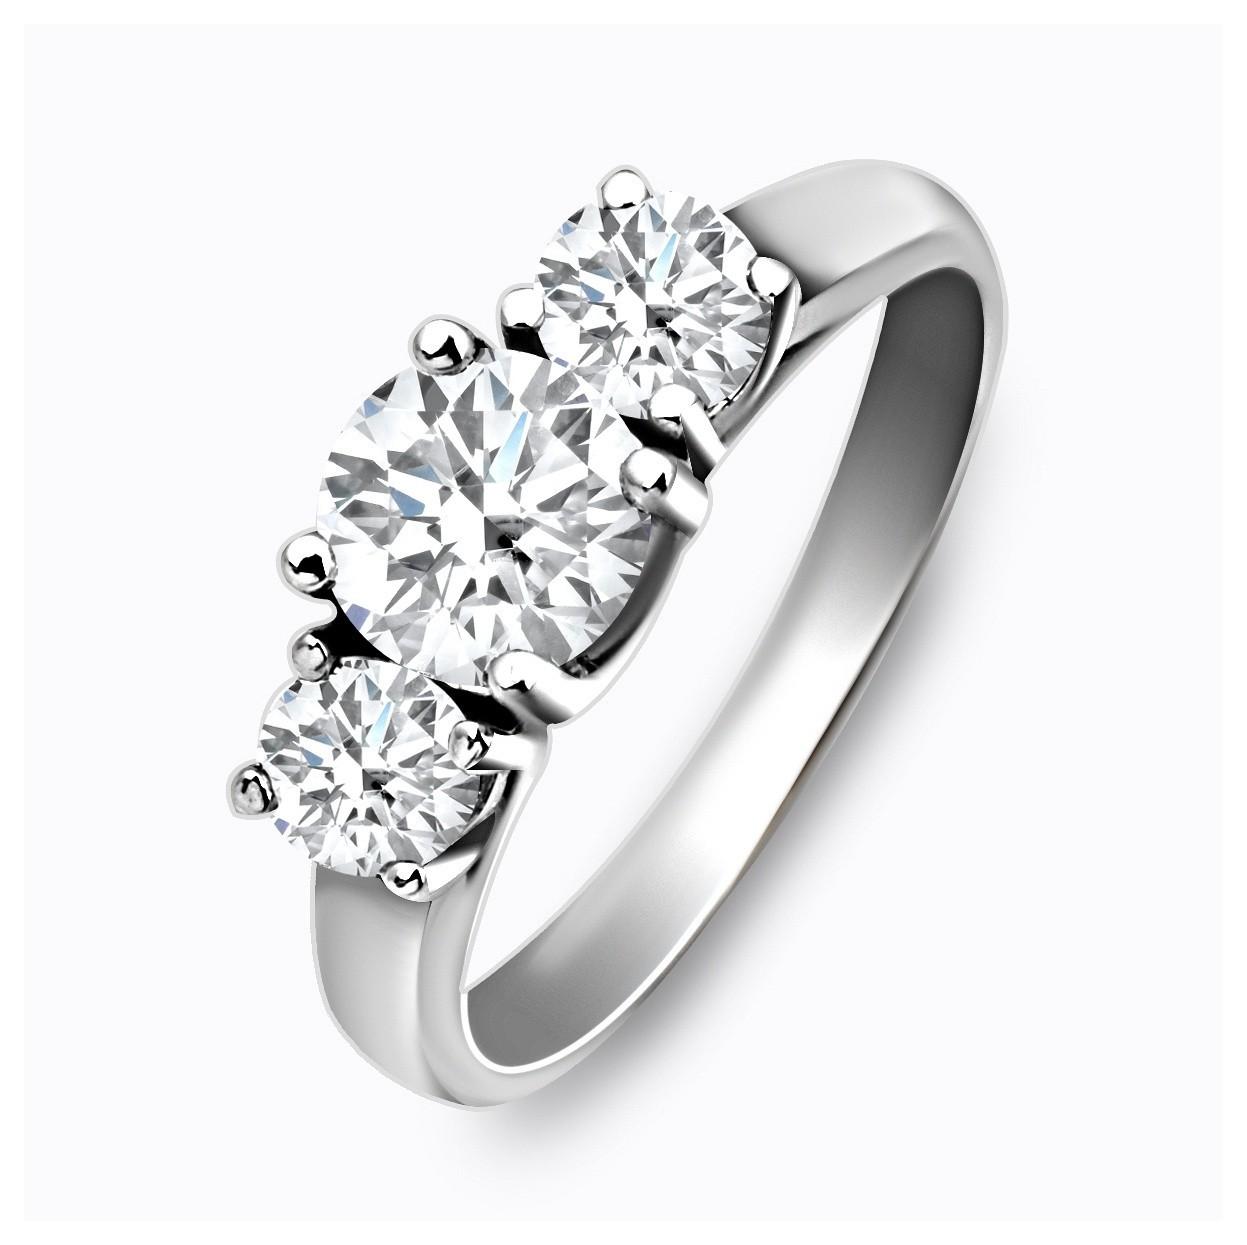 Помолвочное кольцо из белого золота с бриллиантами 027353   ЗлатоГрад f7b64f16a2e